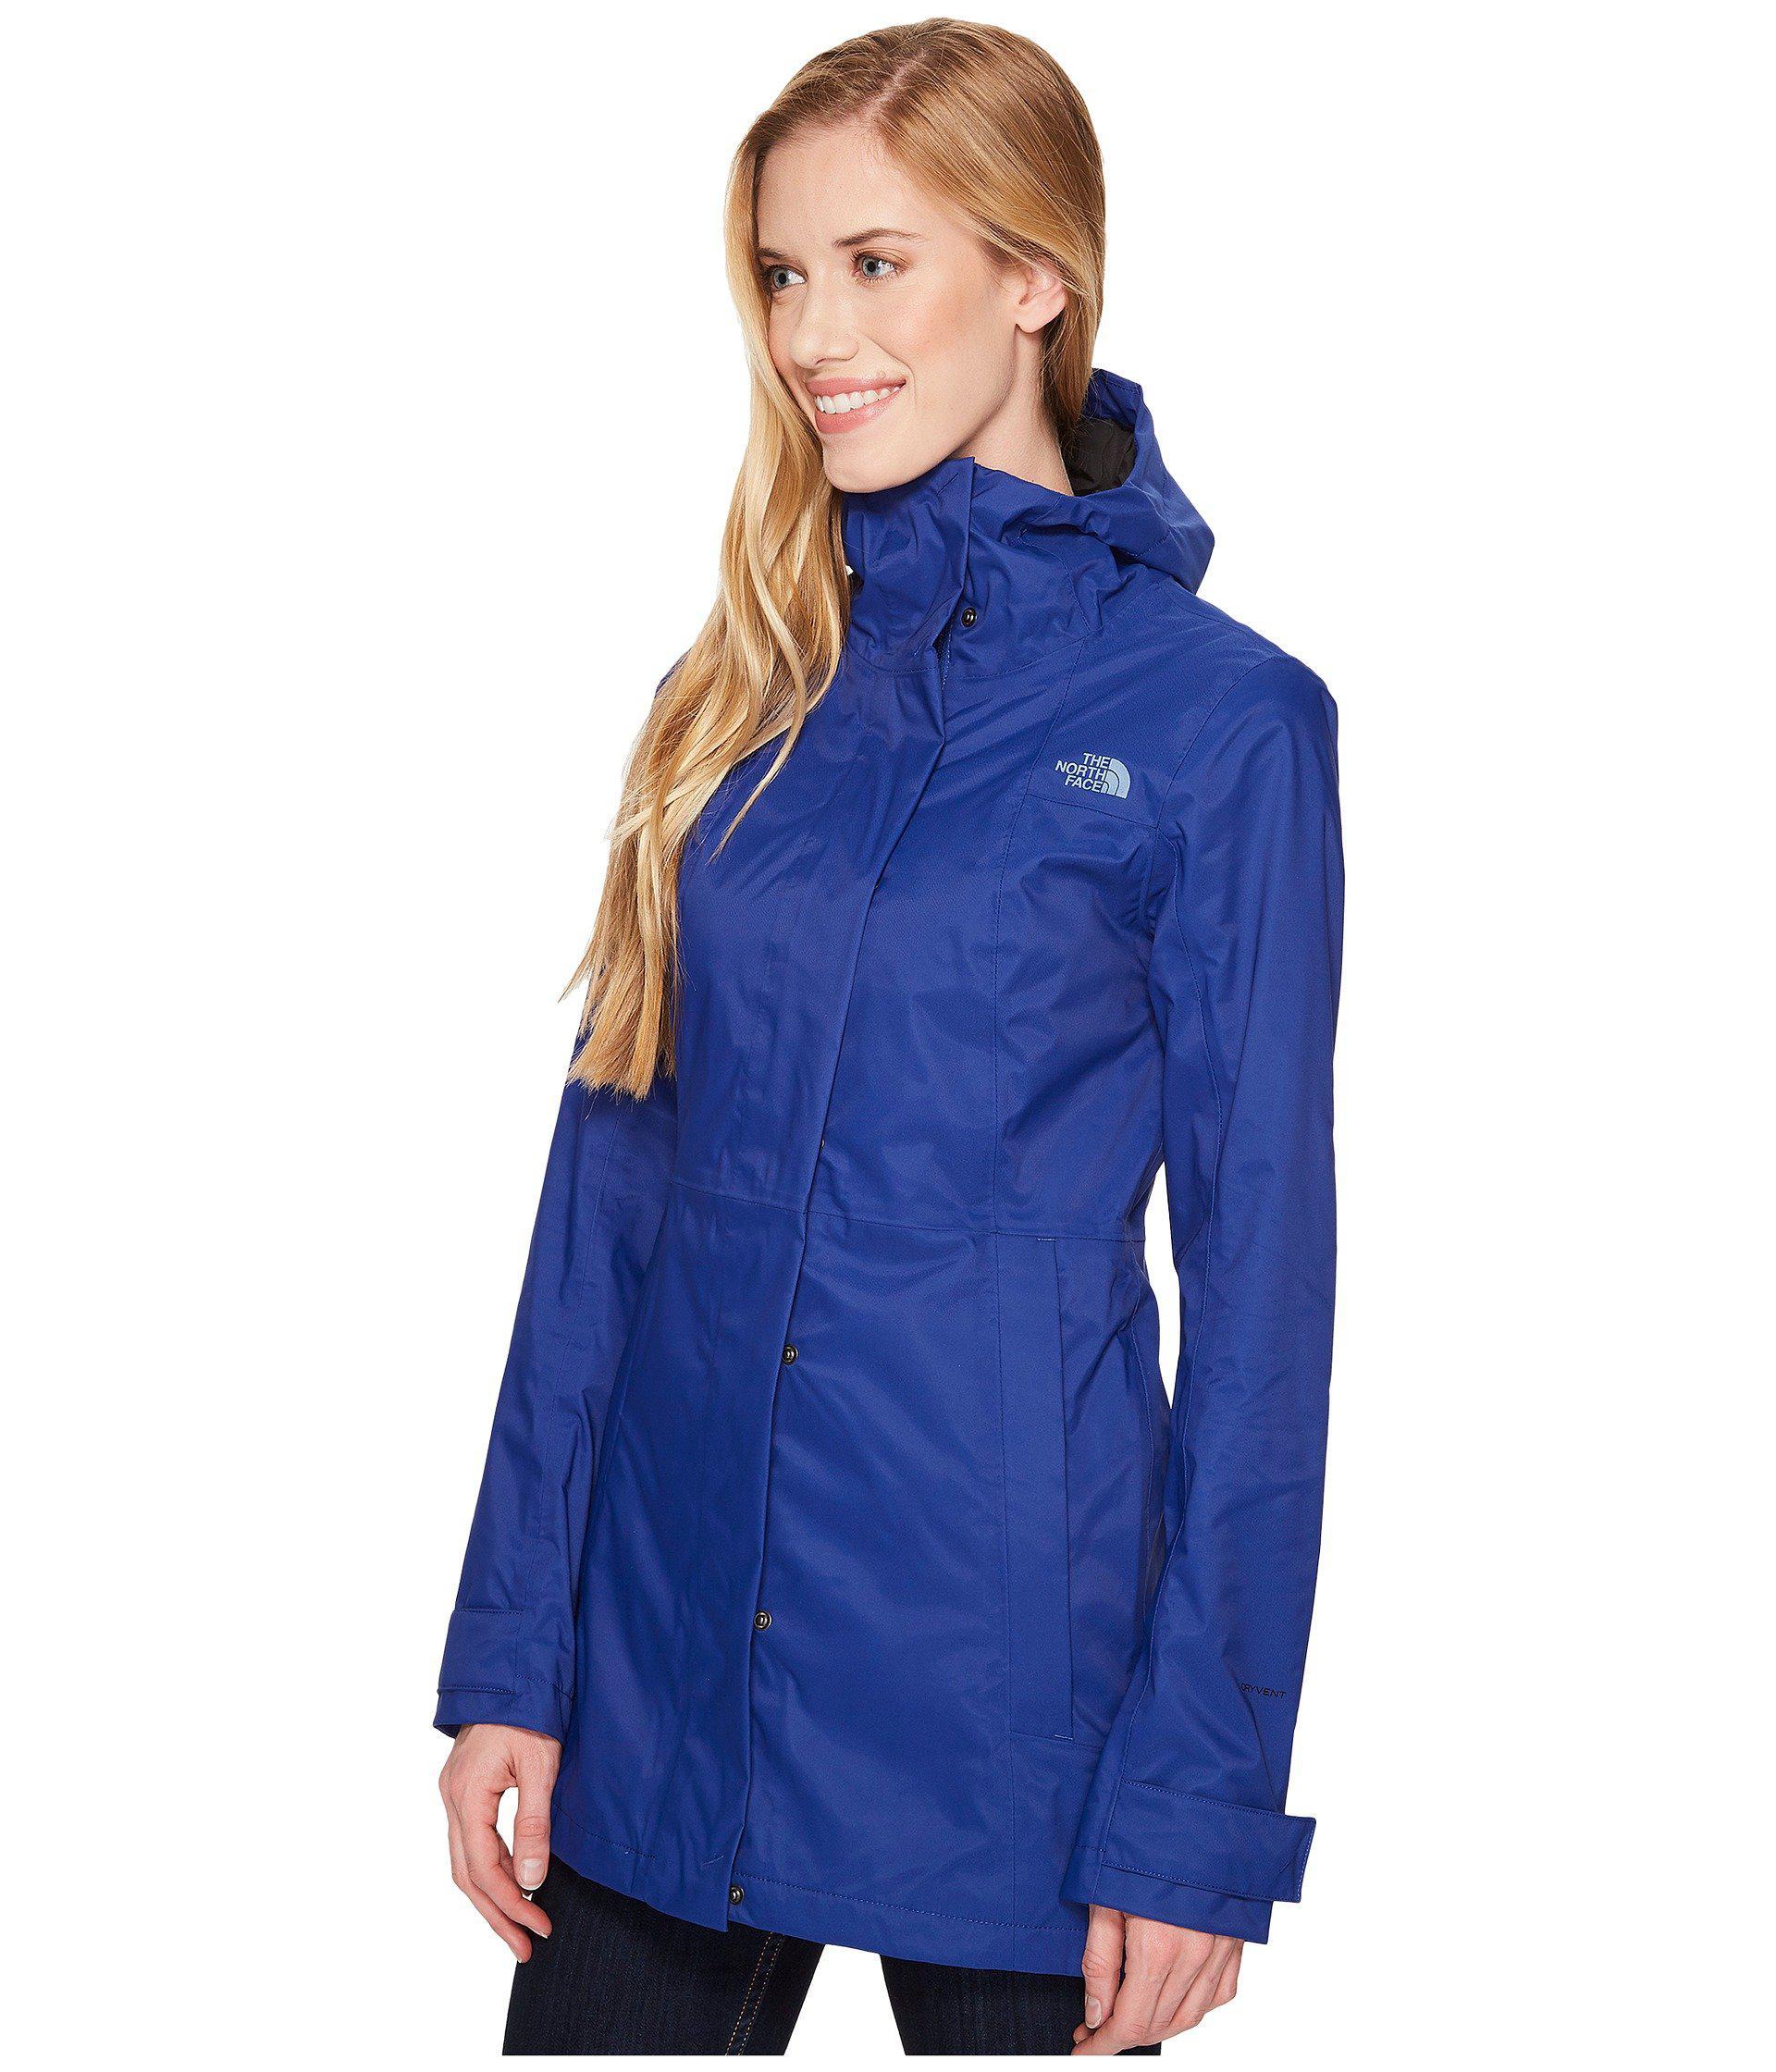 e30a42036d95 Lyst - The North Face City Midi Trench (tnf Black) Women s Coat in Blue